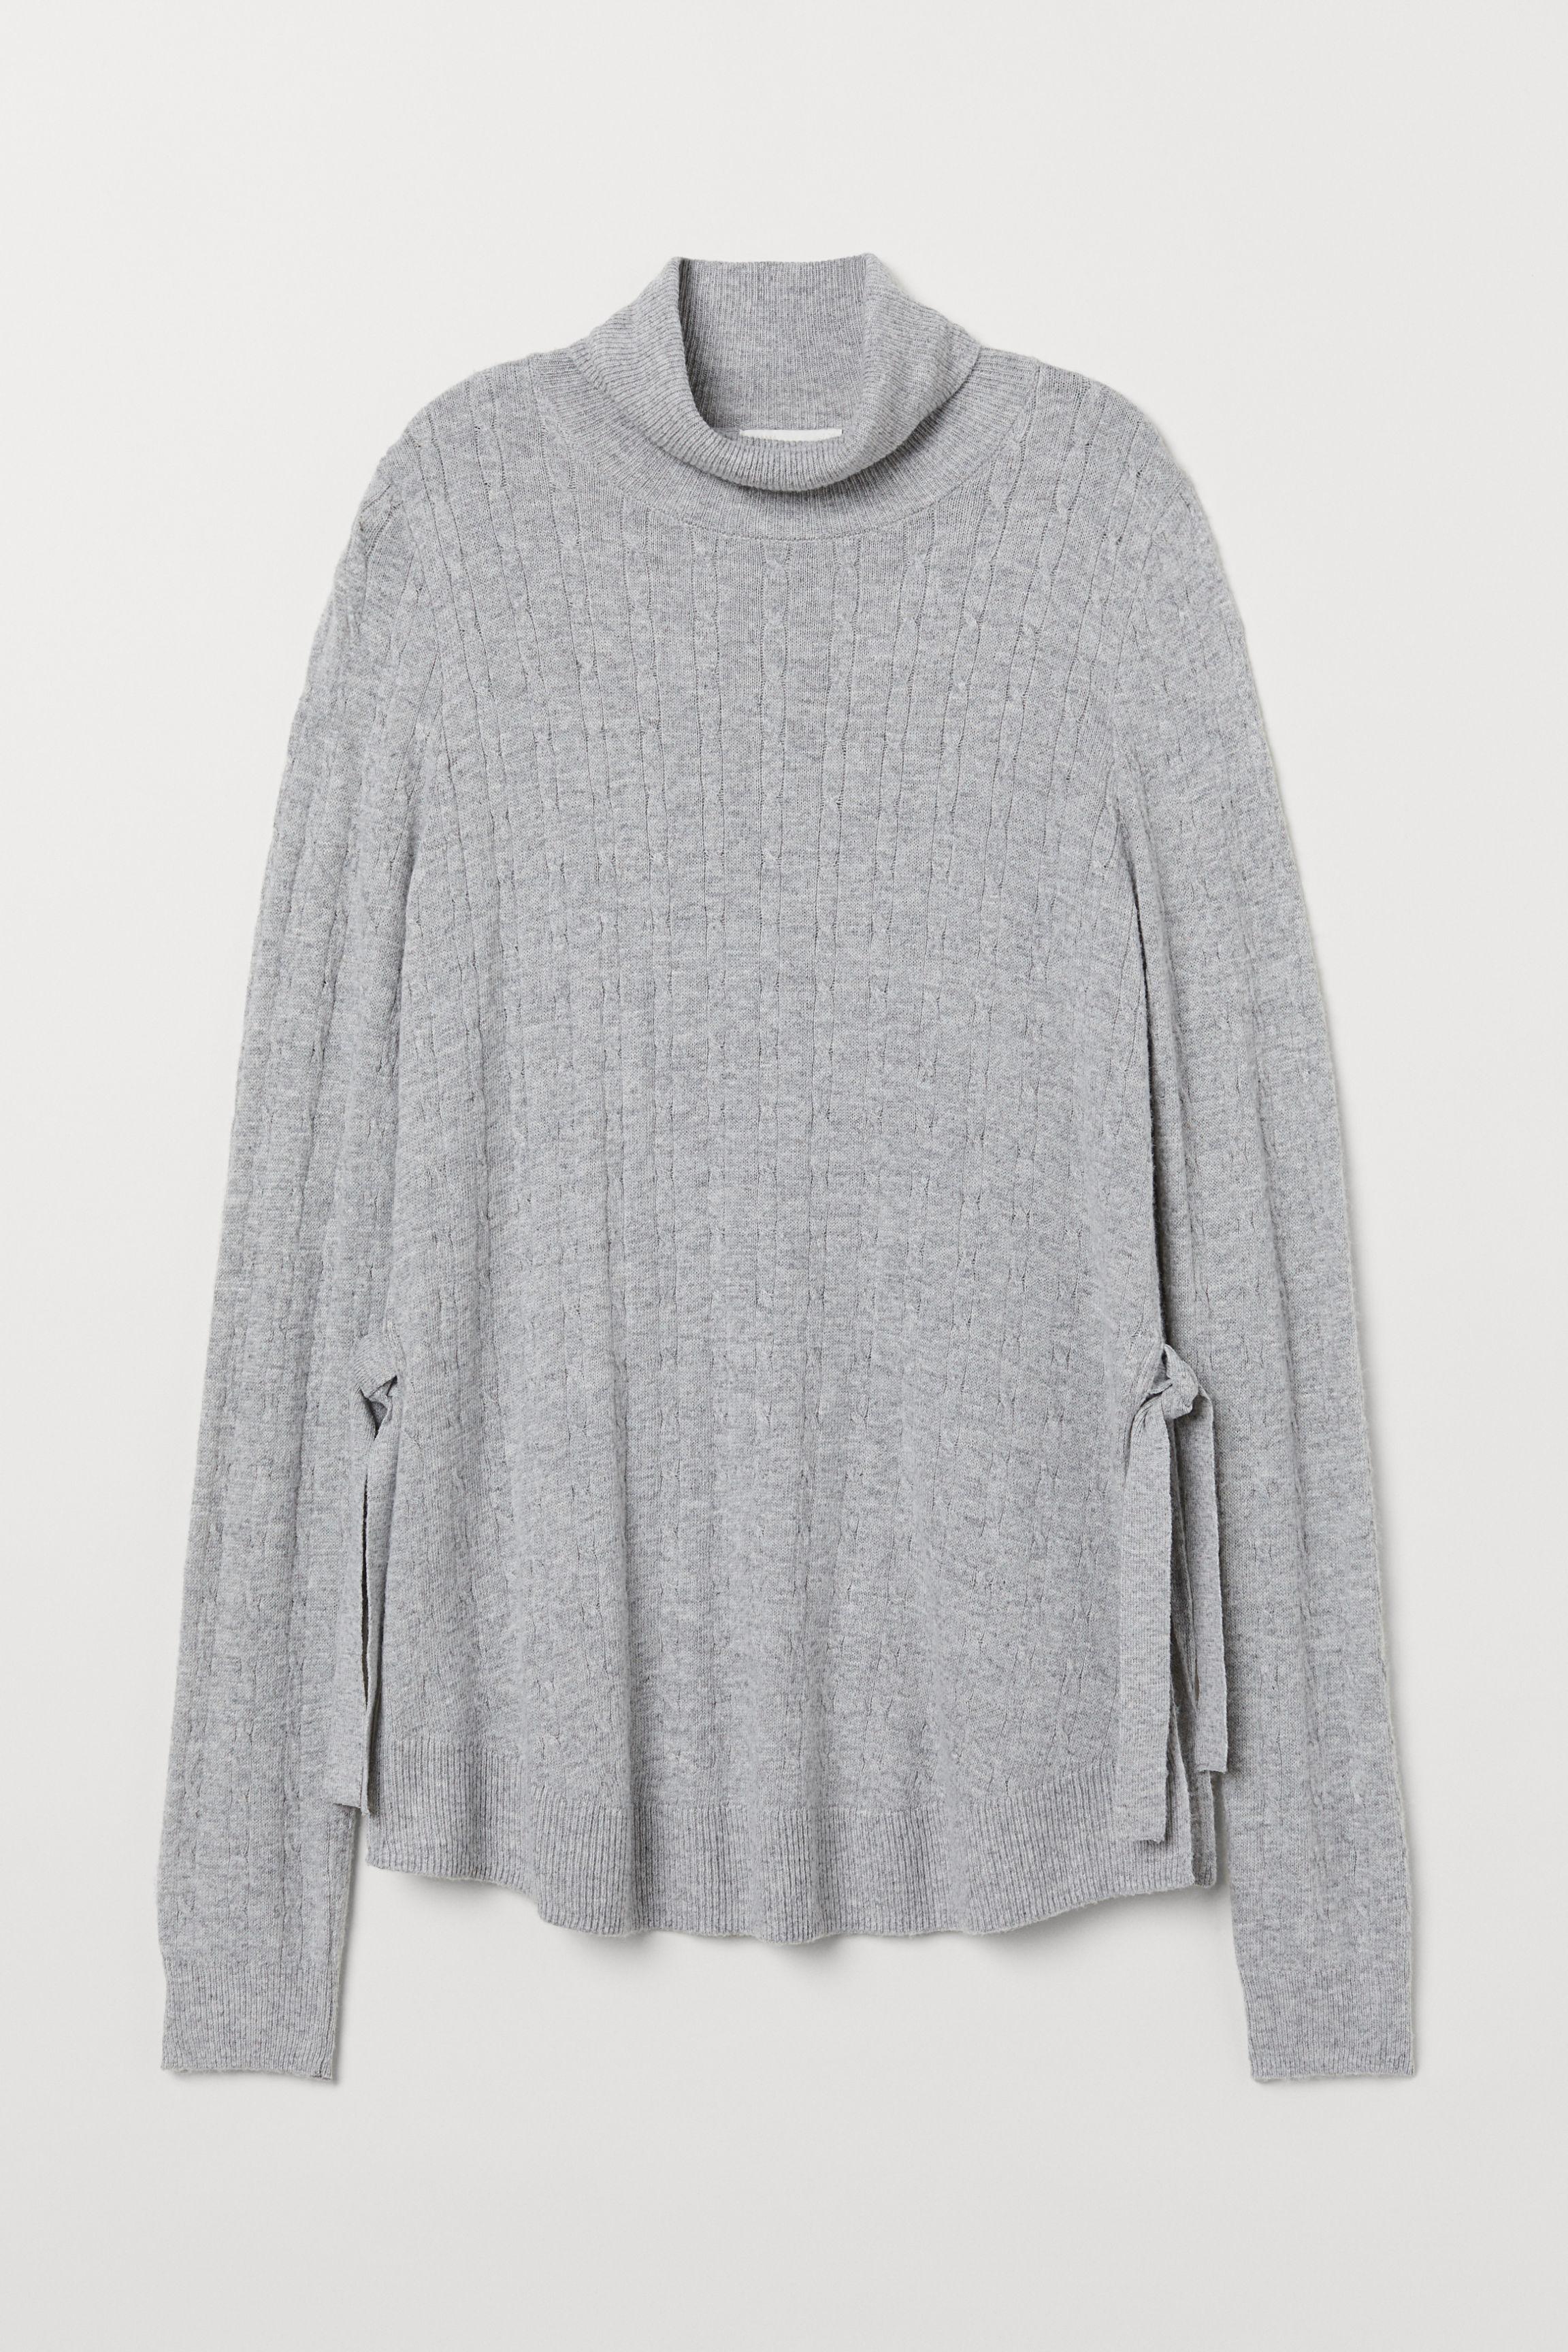 301a716c4a MAMA Knit Nursing Sweater - Light gray melange - Ladies